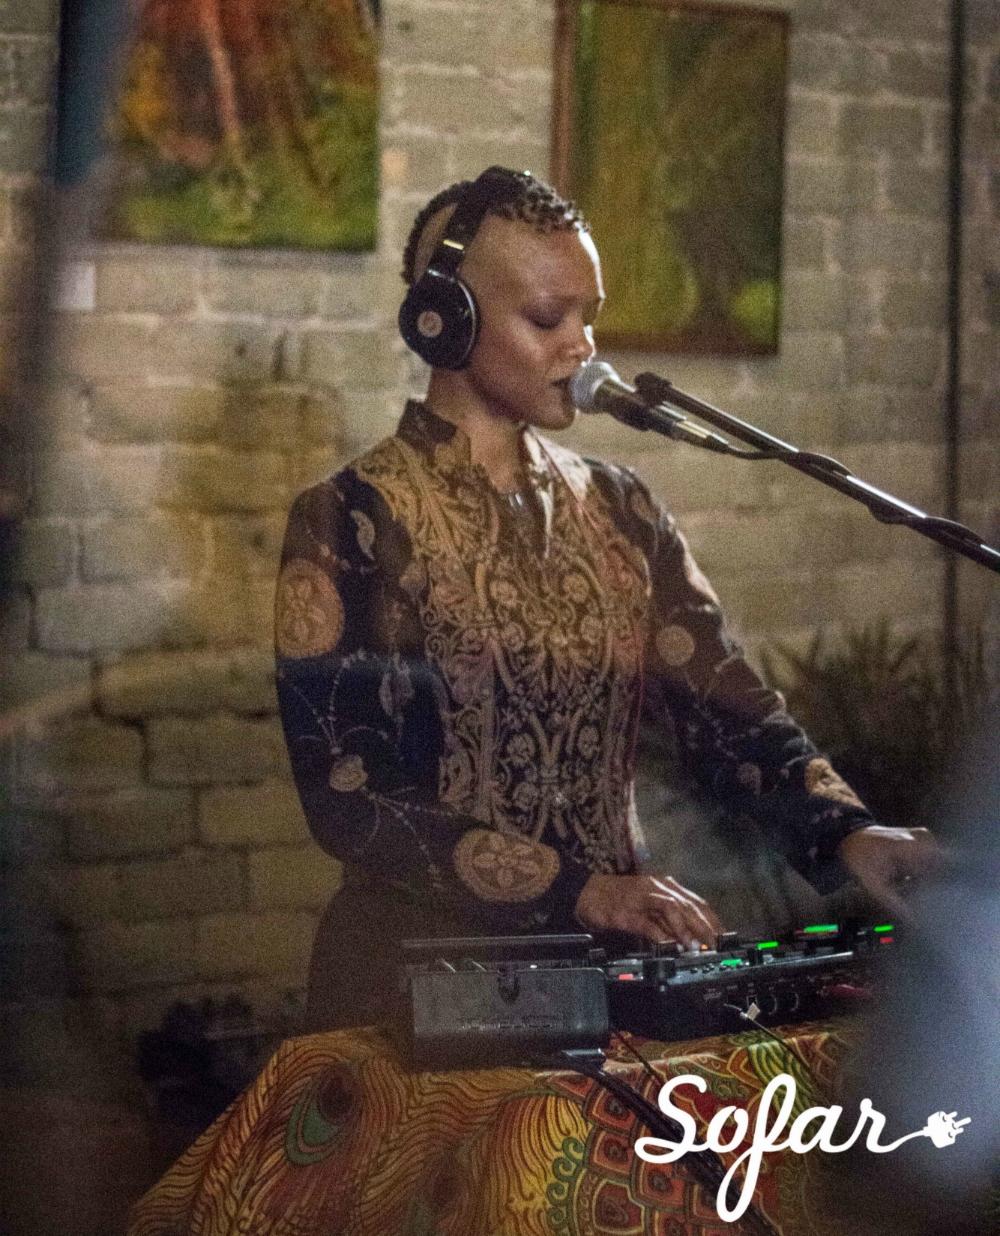 Siana-Altiise-Sofar-Noise-Atlanta.jpg